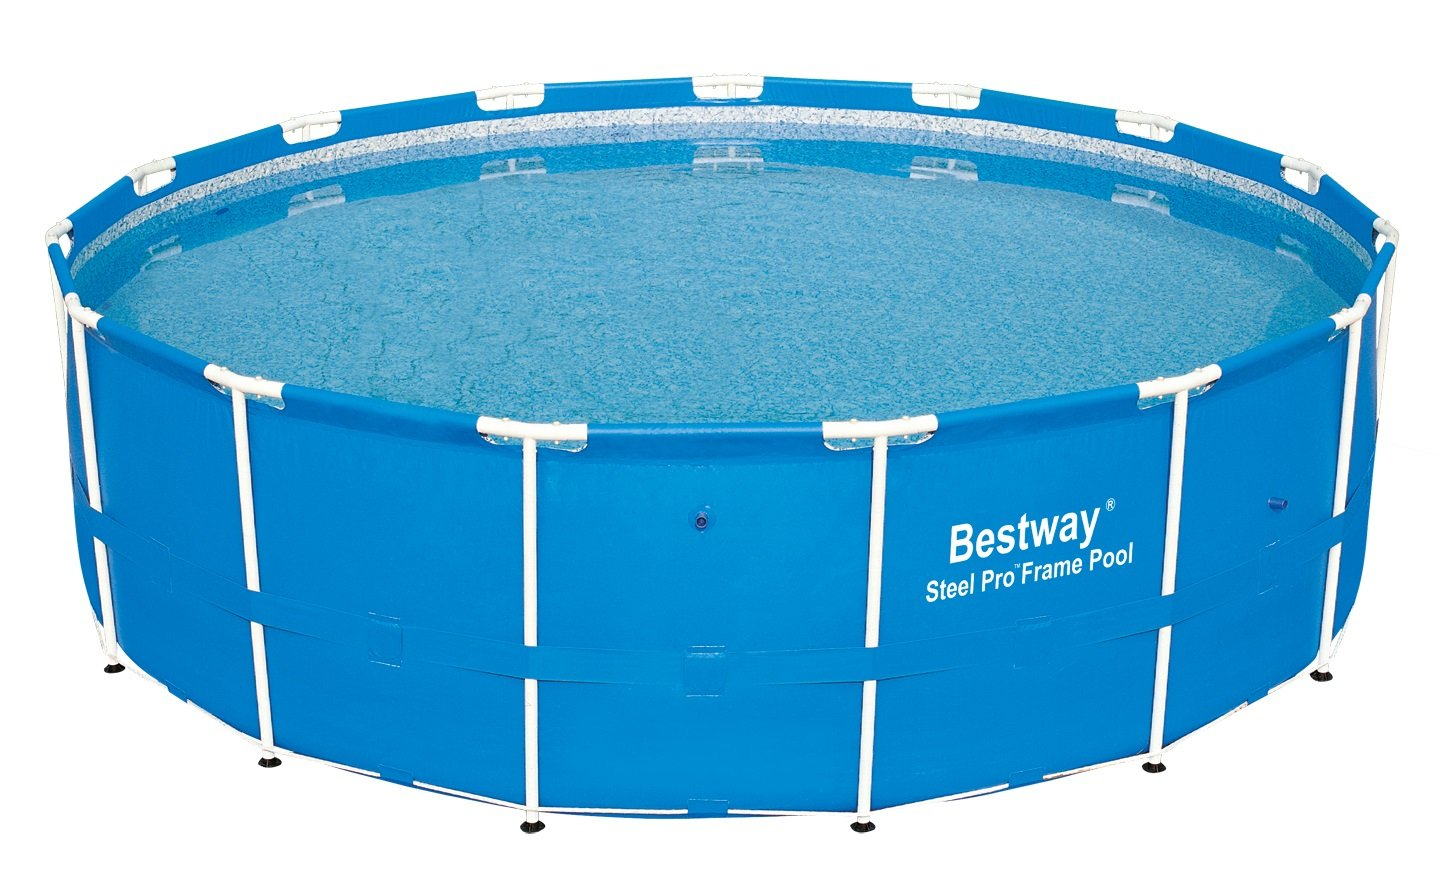 Bestway Steel Pro Above Ground 15ft x 48in Backyard Frame Pool Set